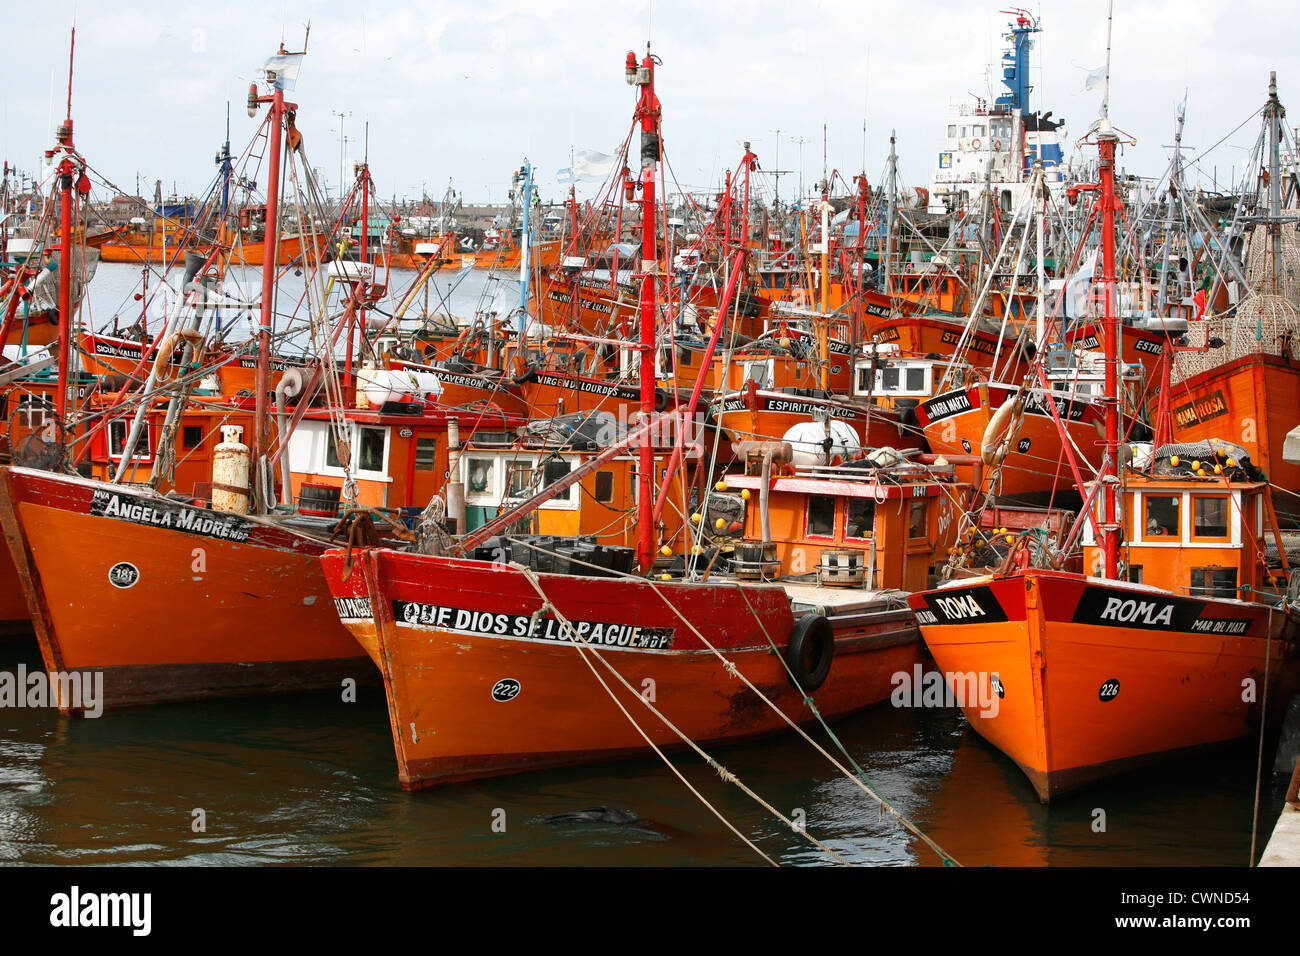 Fishing boats at the port, Mar del Plata, Argentina. - Stock Image